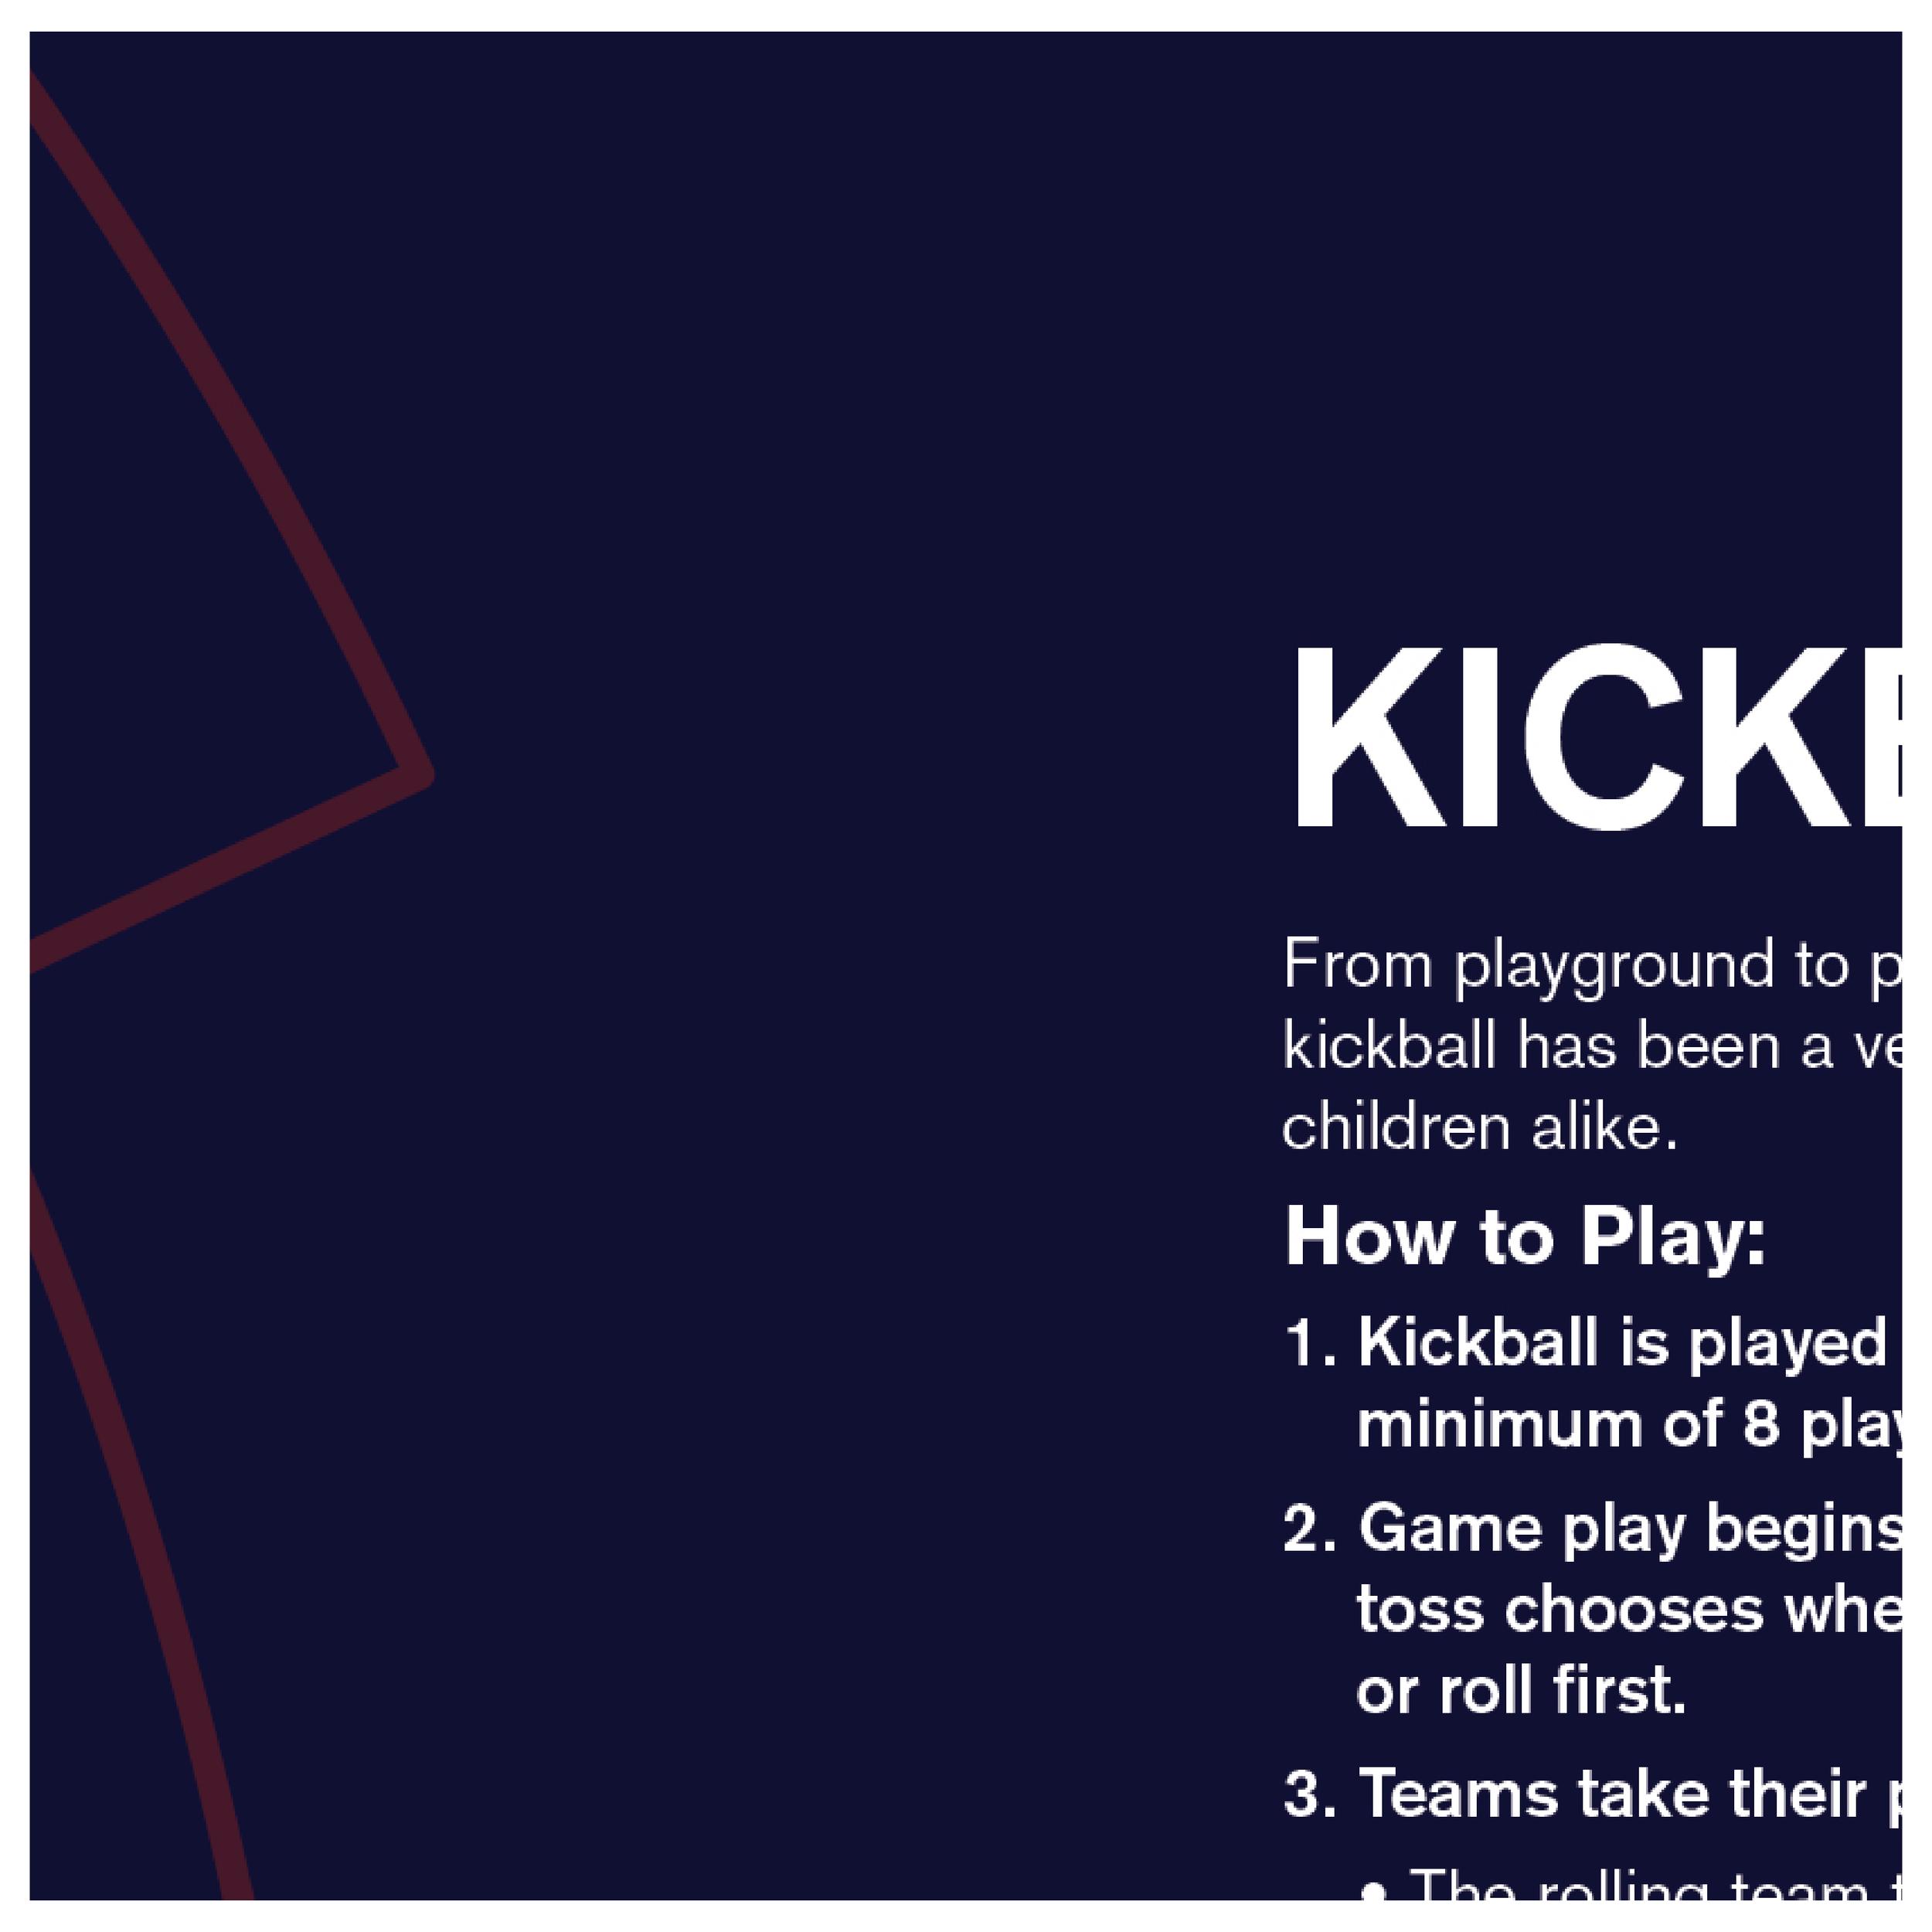 Posters Kickball-05.png